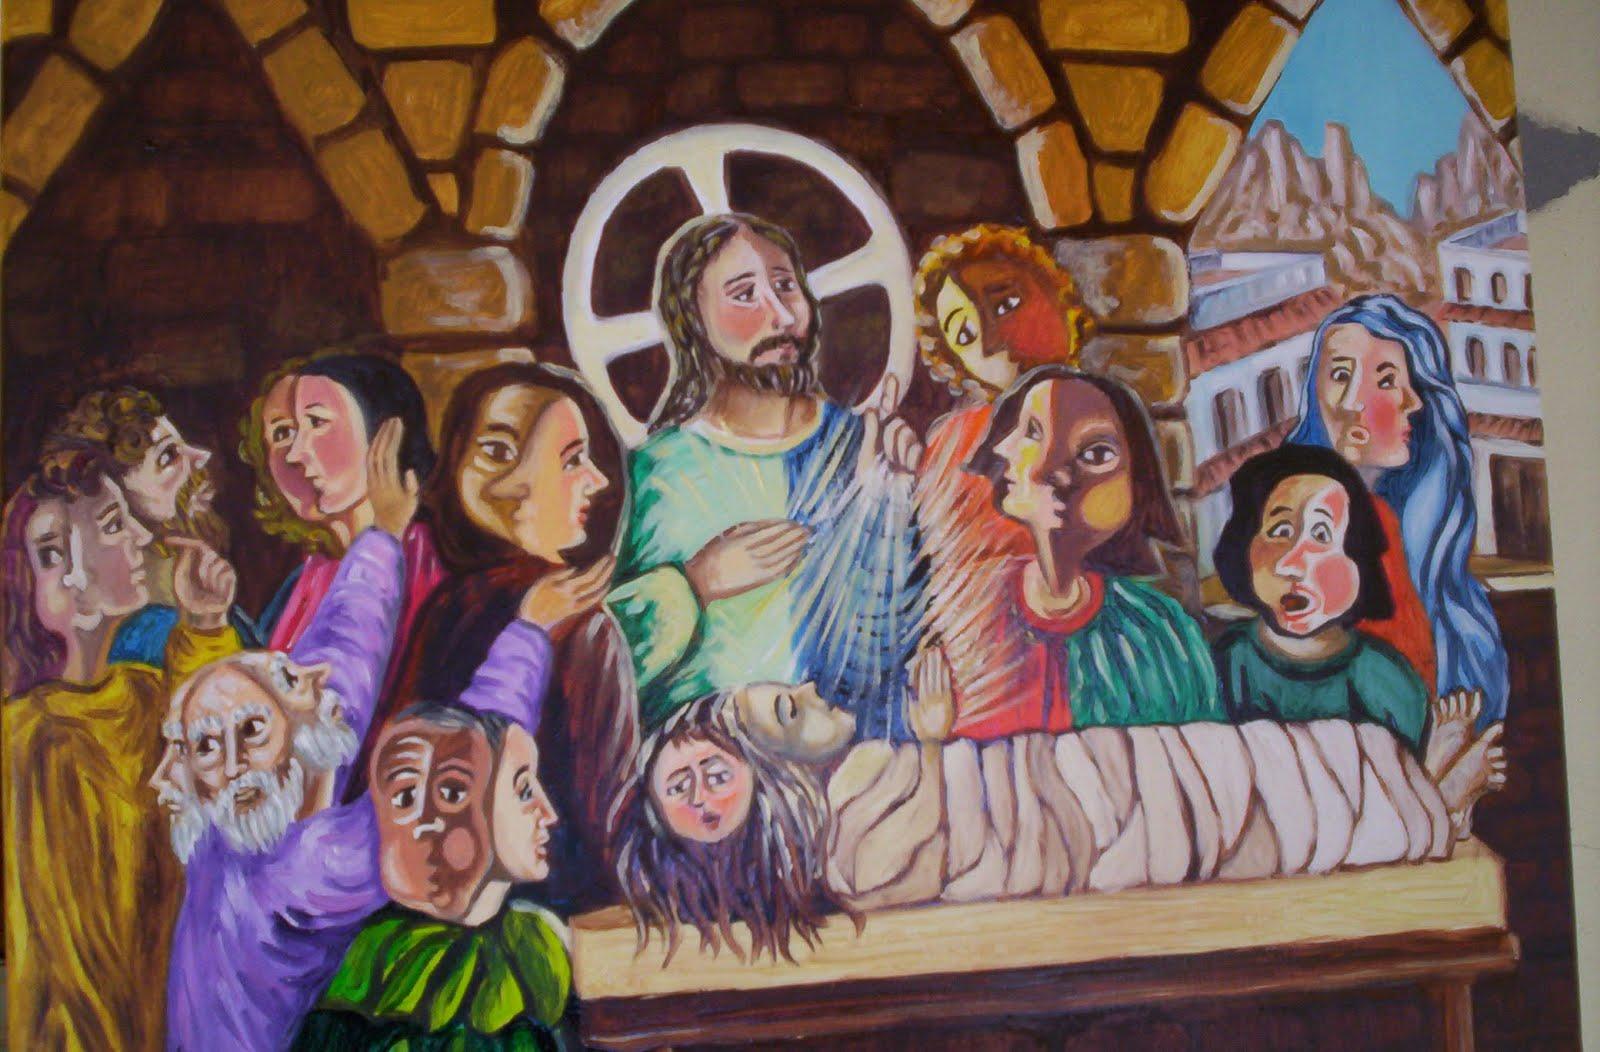 asuntosdejesucristo